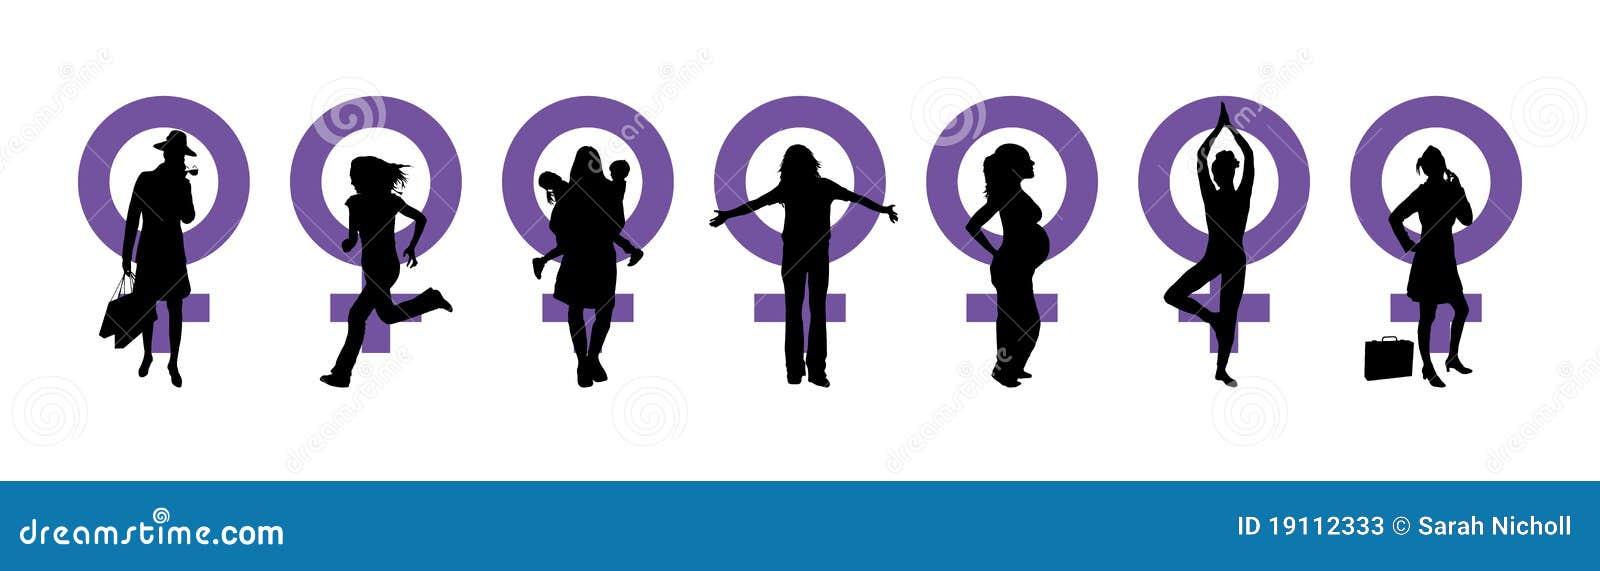 Womens Day Banner Stock Illustration Illustration Of Freedom